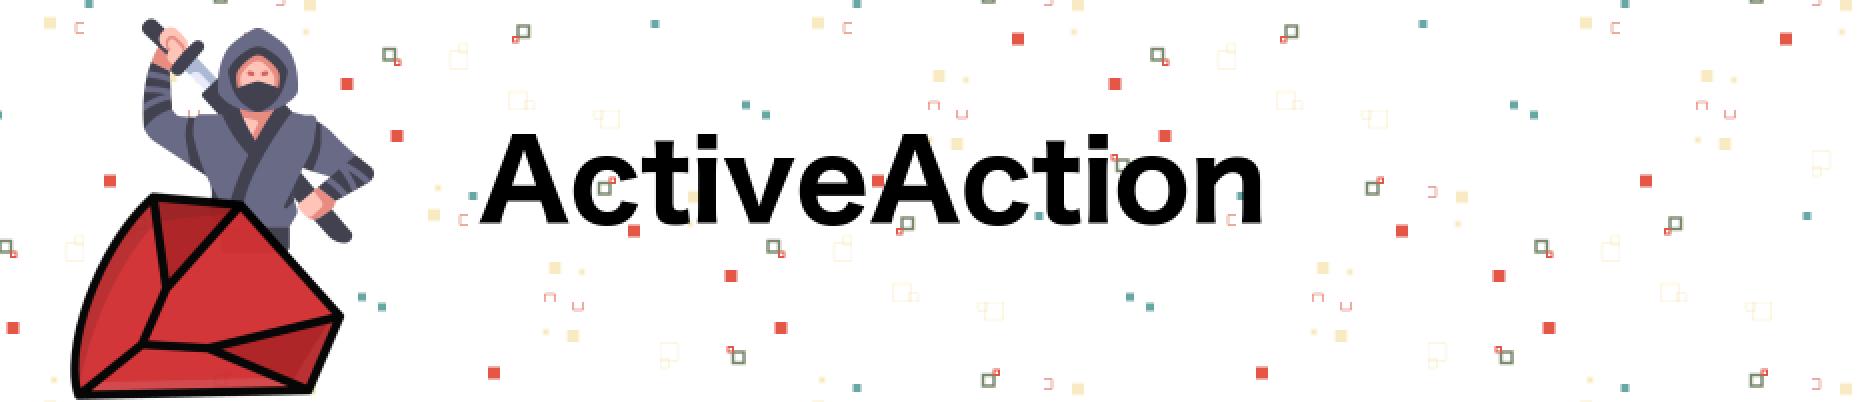 ActiveAction